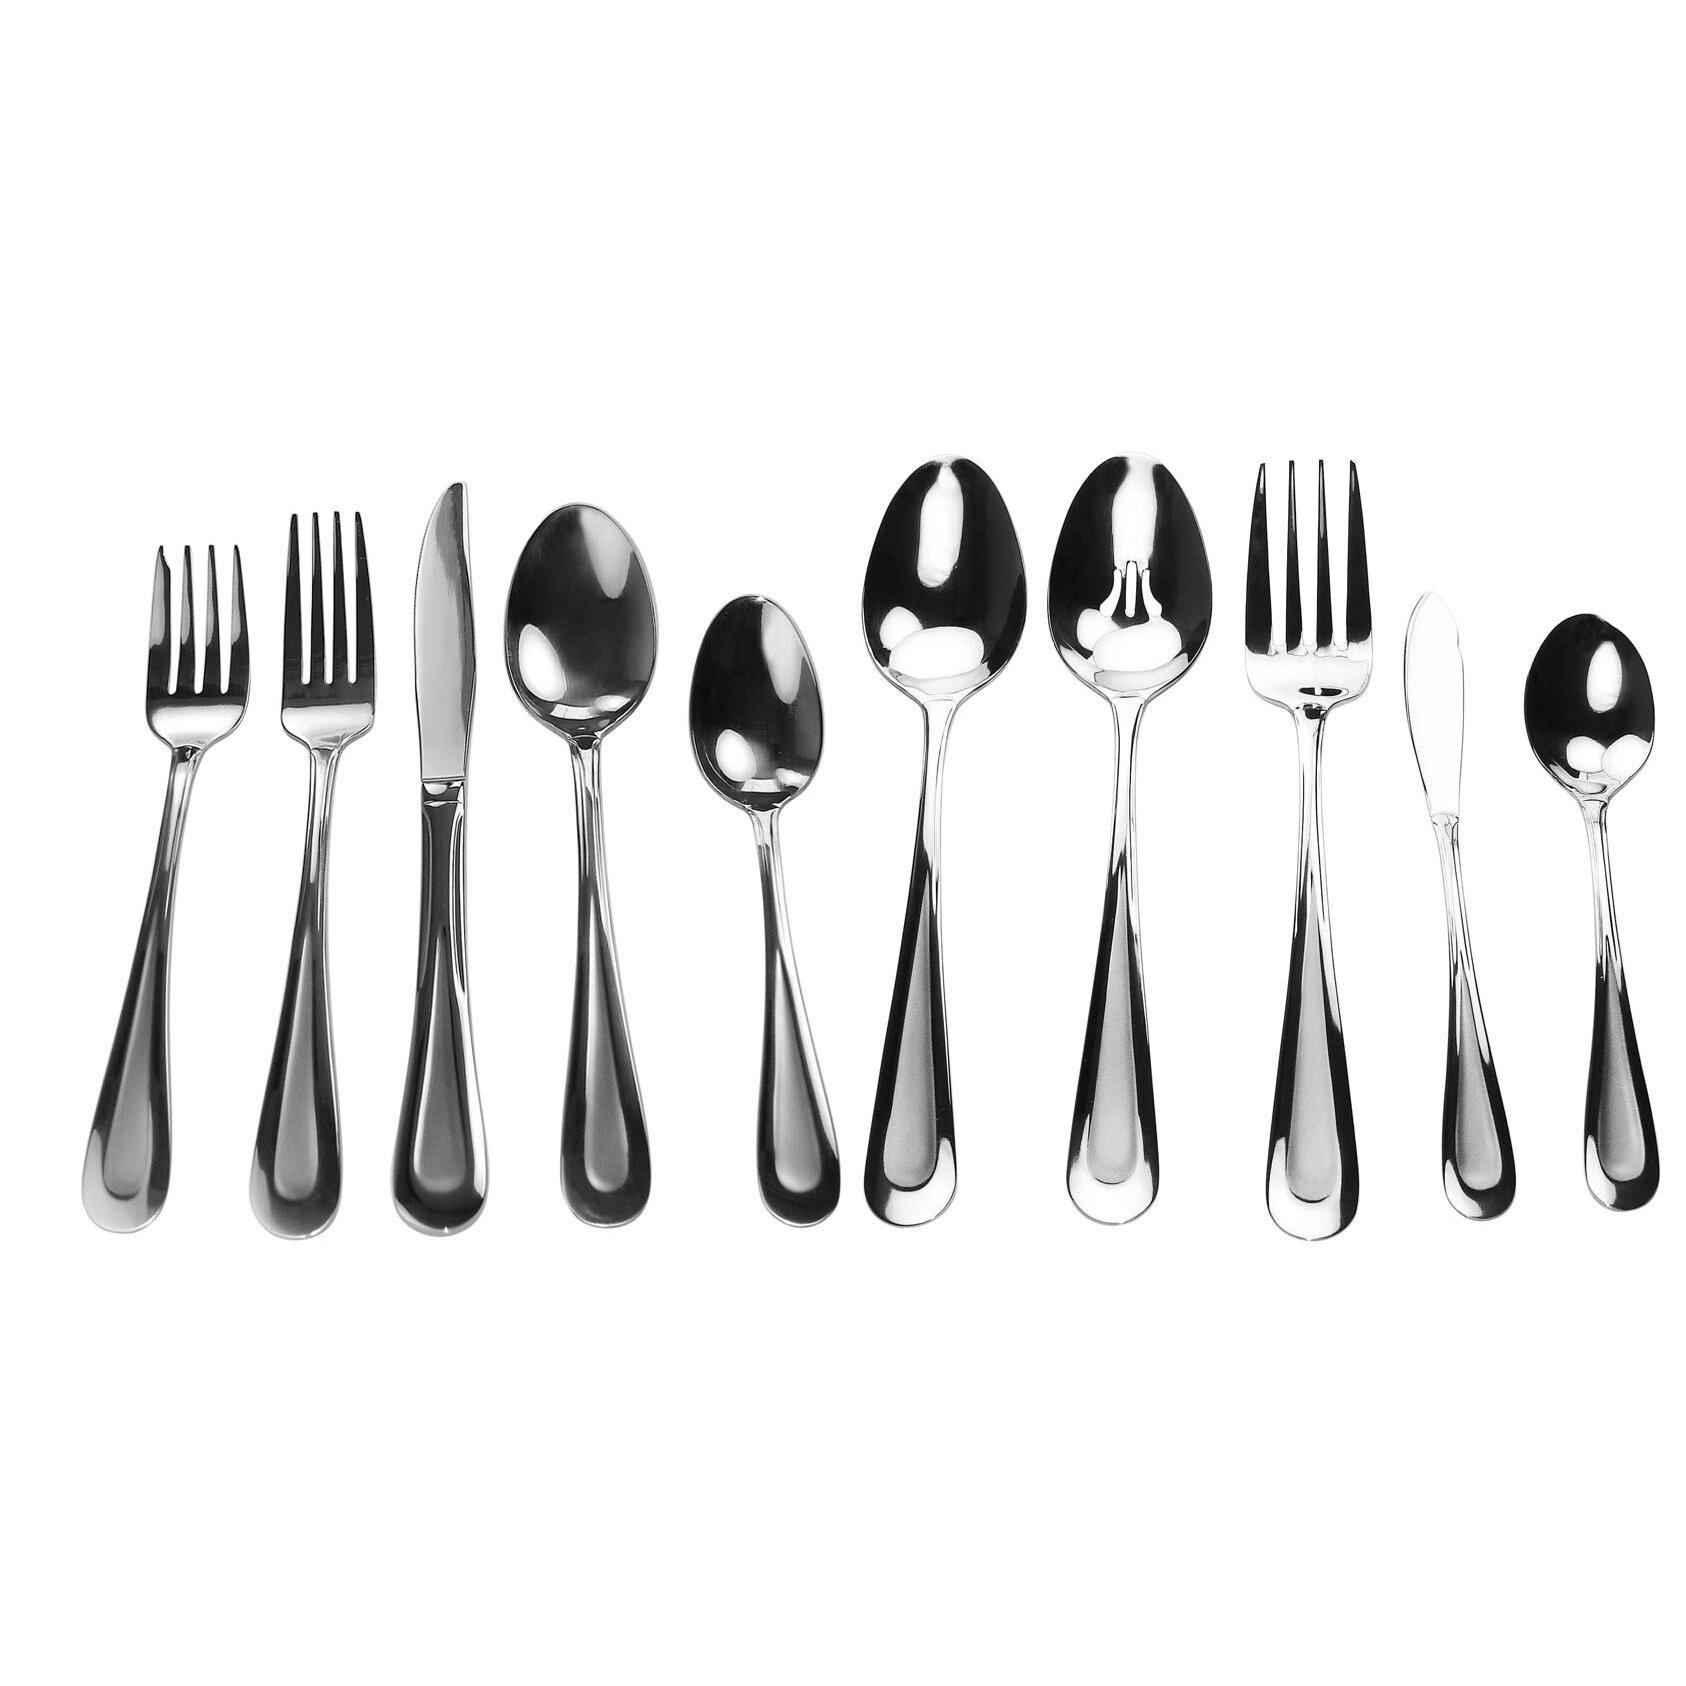 David shaw silverware splendide ruse 45 piece flatware set reviews wayfair - Splendide flatware ...